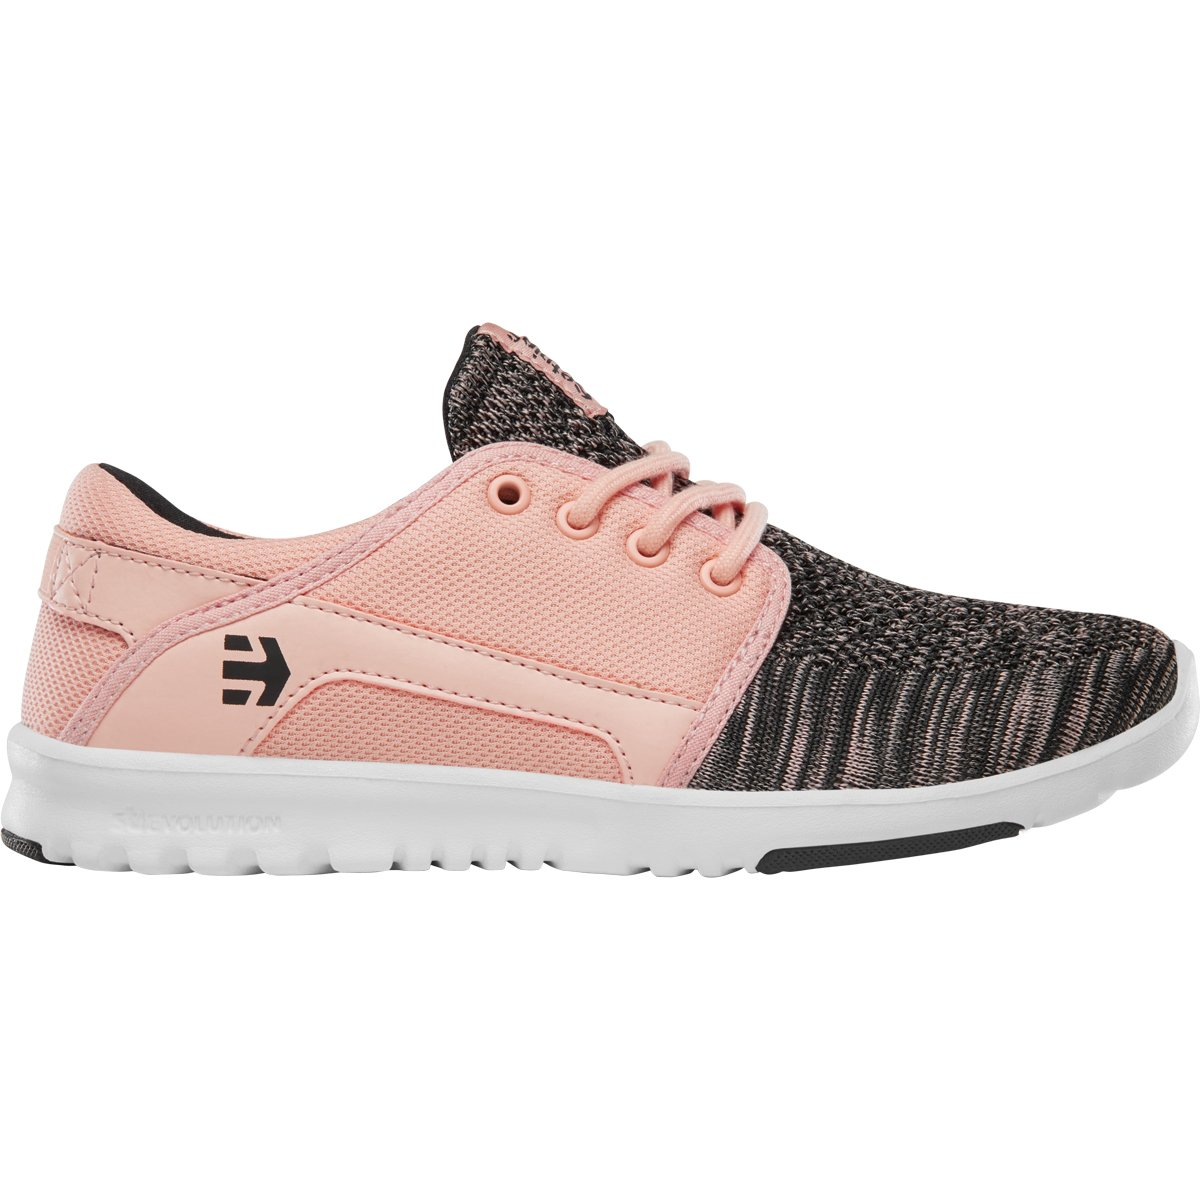 Etnies Women's Scout YB W's Skateboarding Shoe B0792H4WLK 7.5 B(M) US|Pink/Black